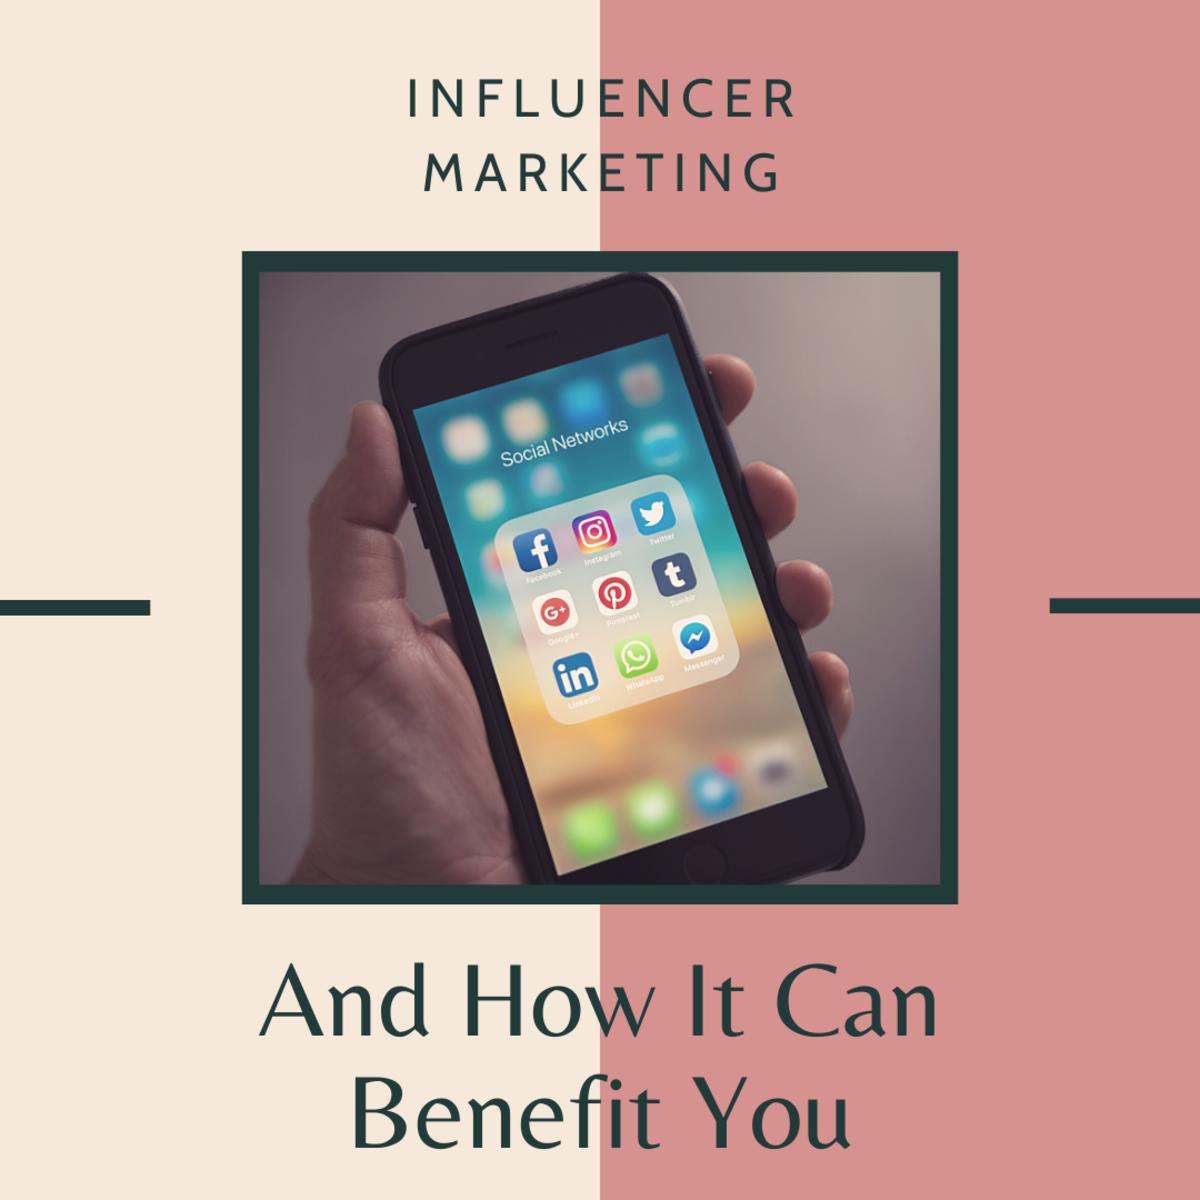 Influencer Marketing: Definition